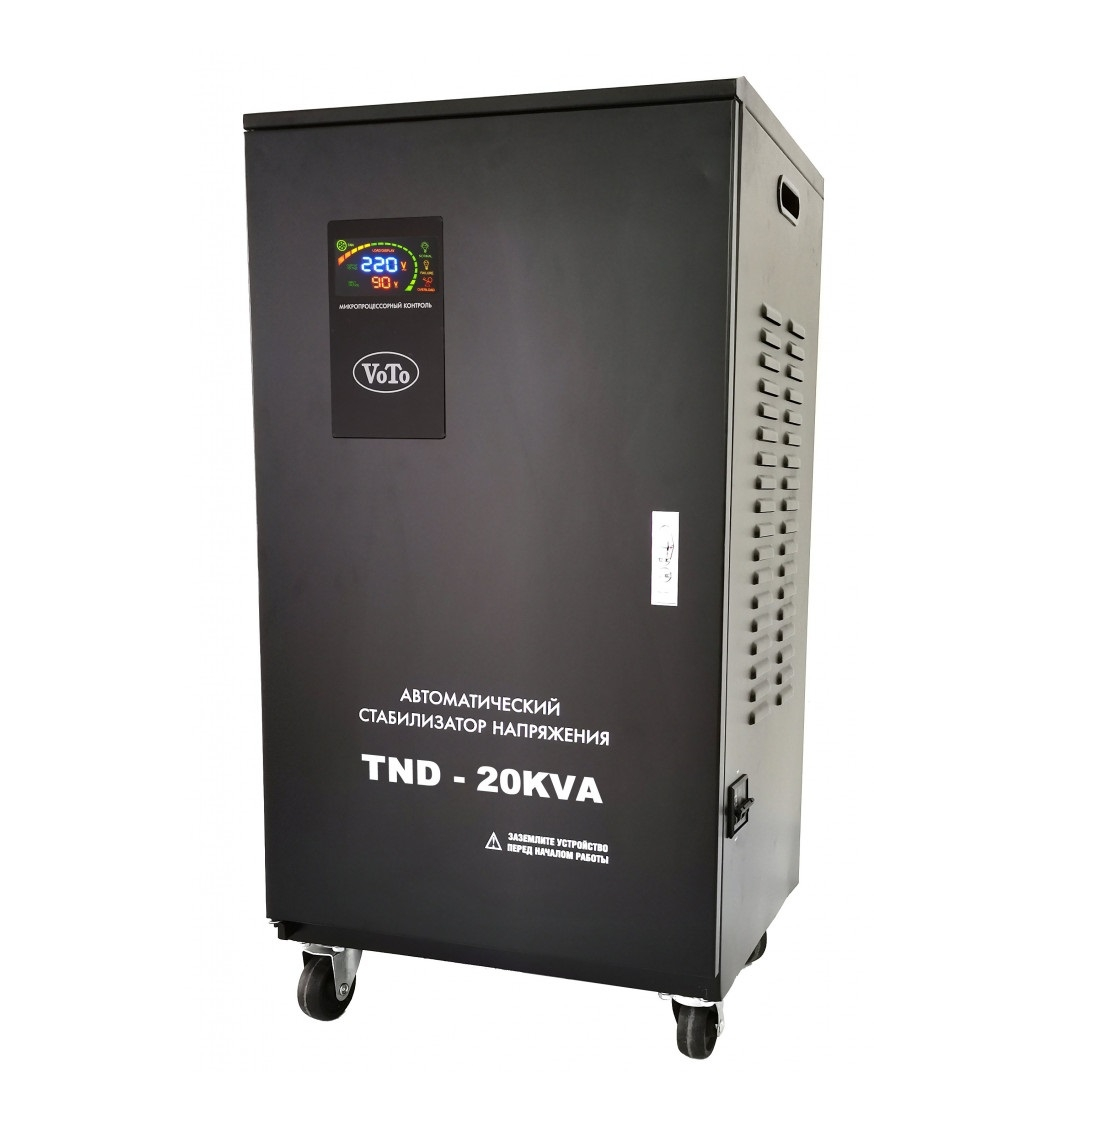 Стабилизатор напряжения VoTo TND 20 KVA (LED)